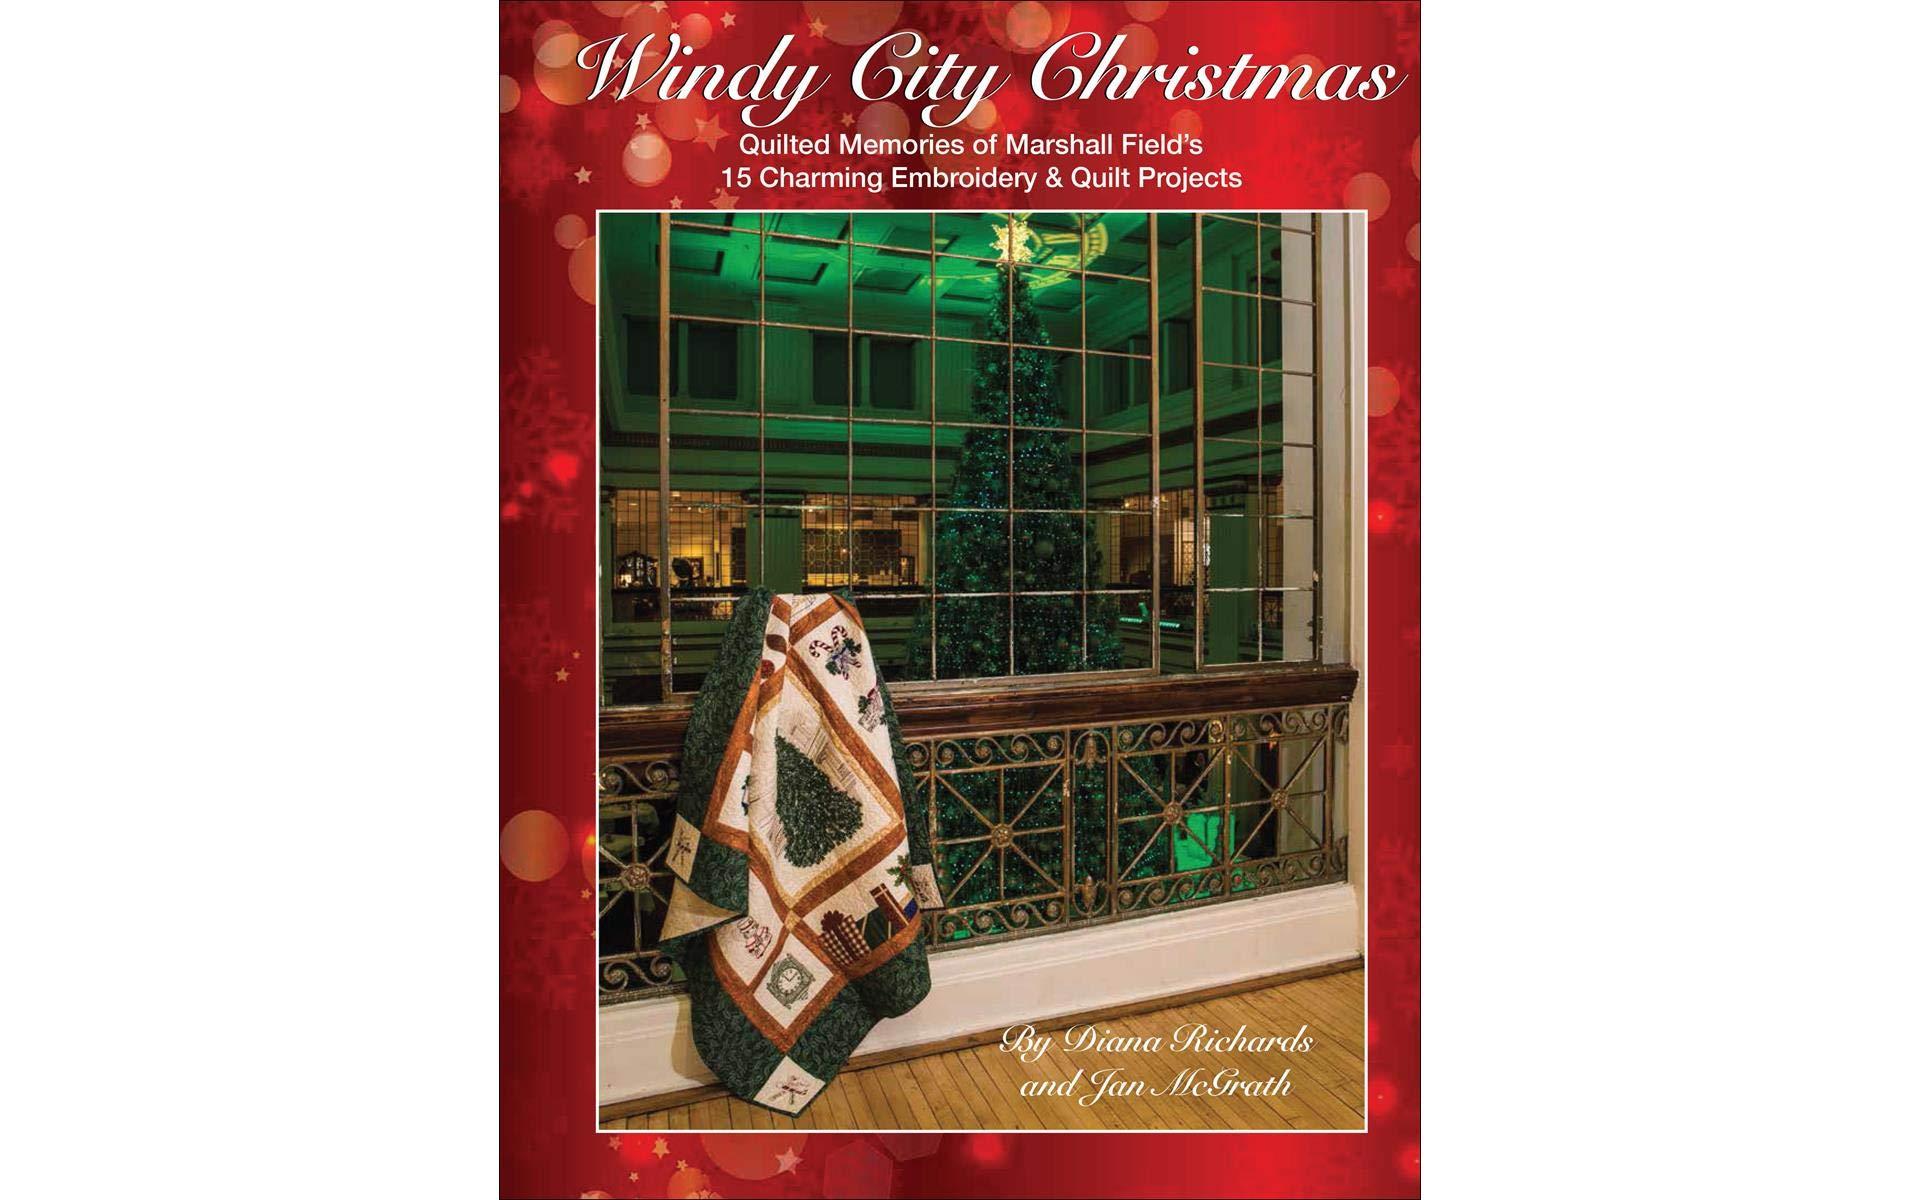 Kansas City Star Windy City Christmas Bk